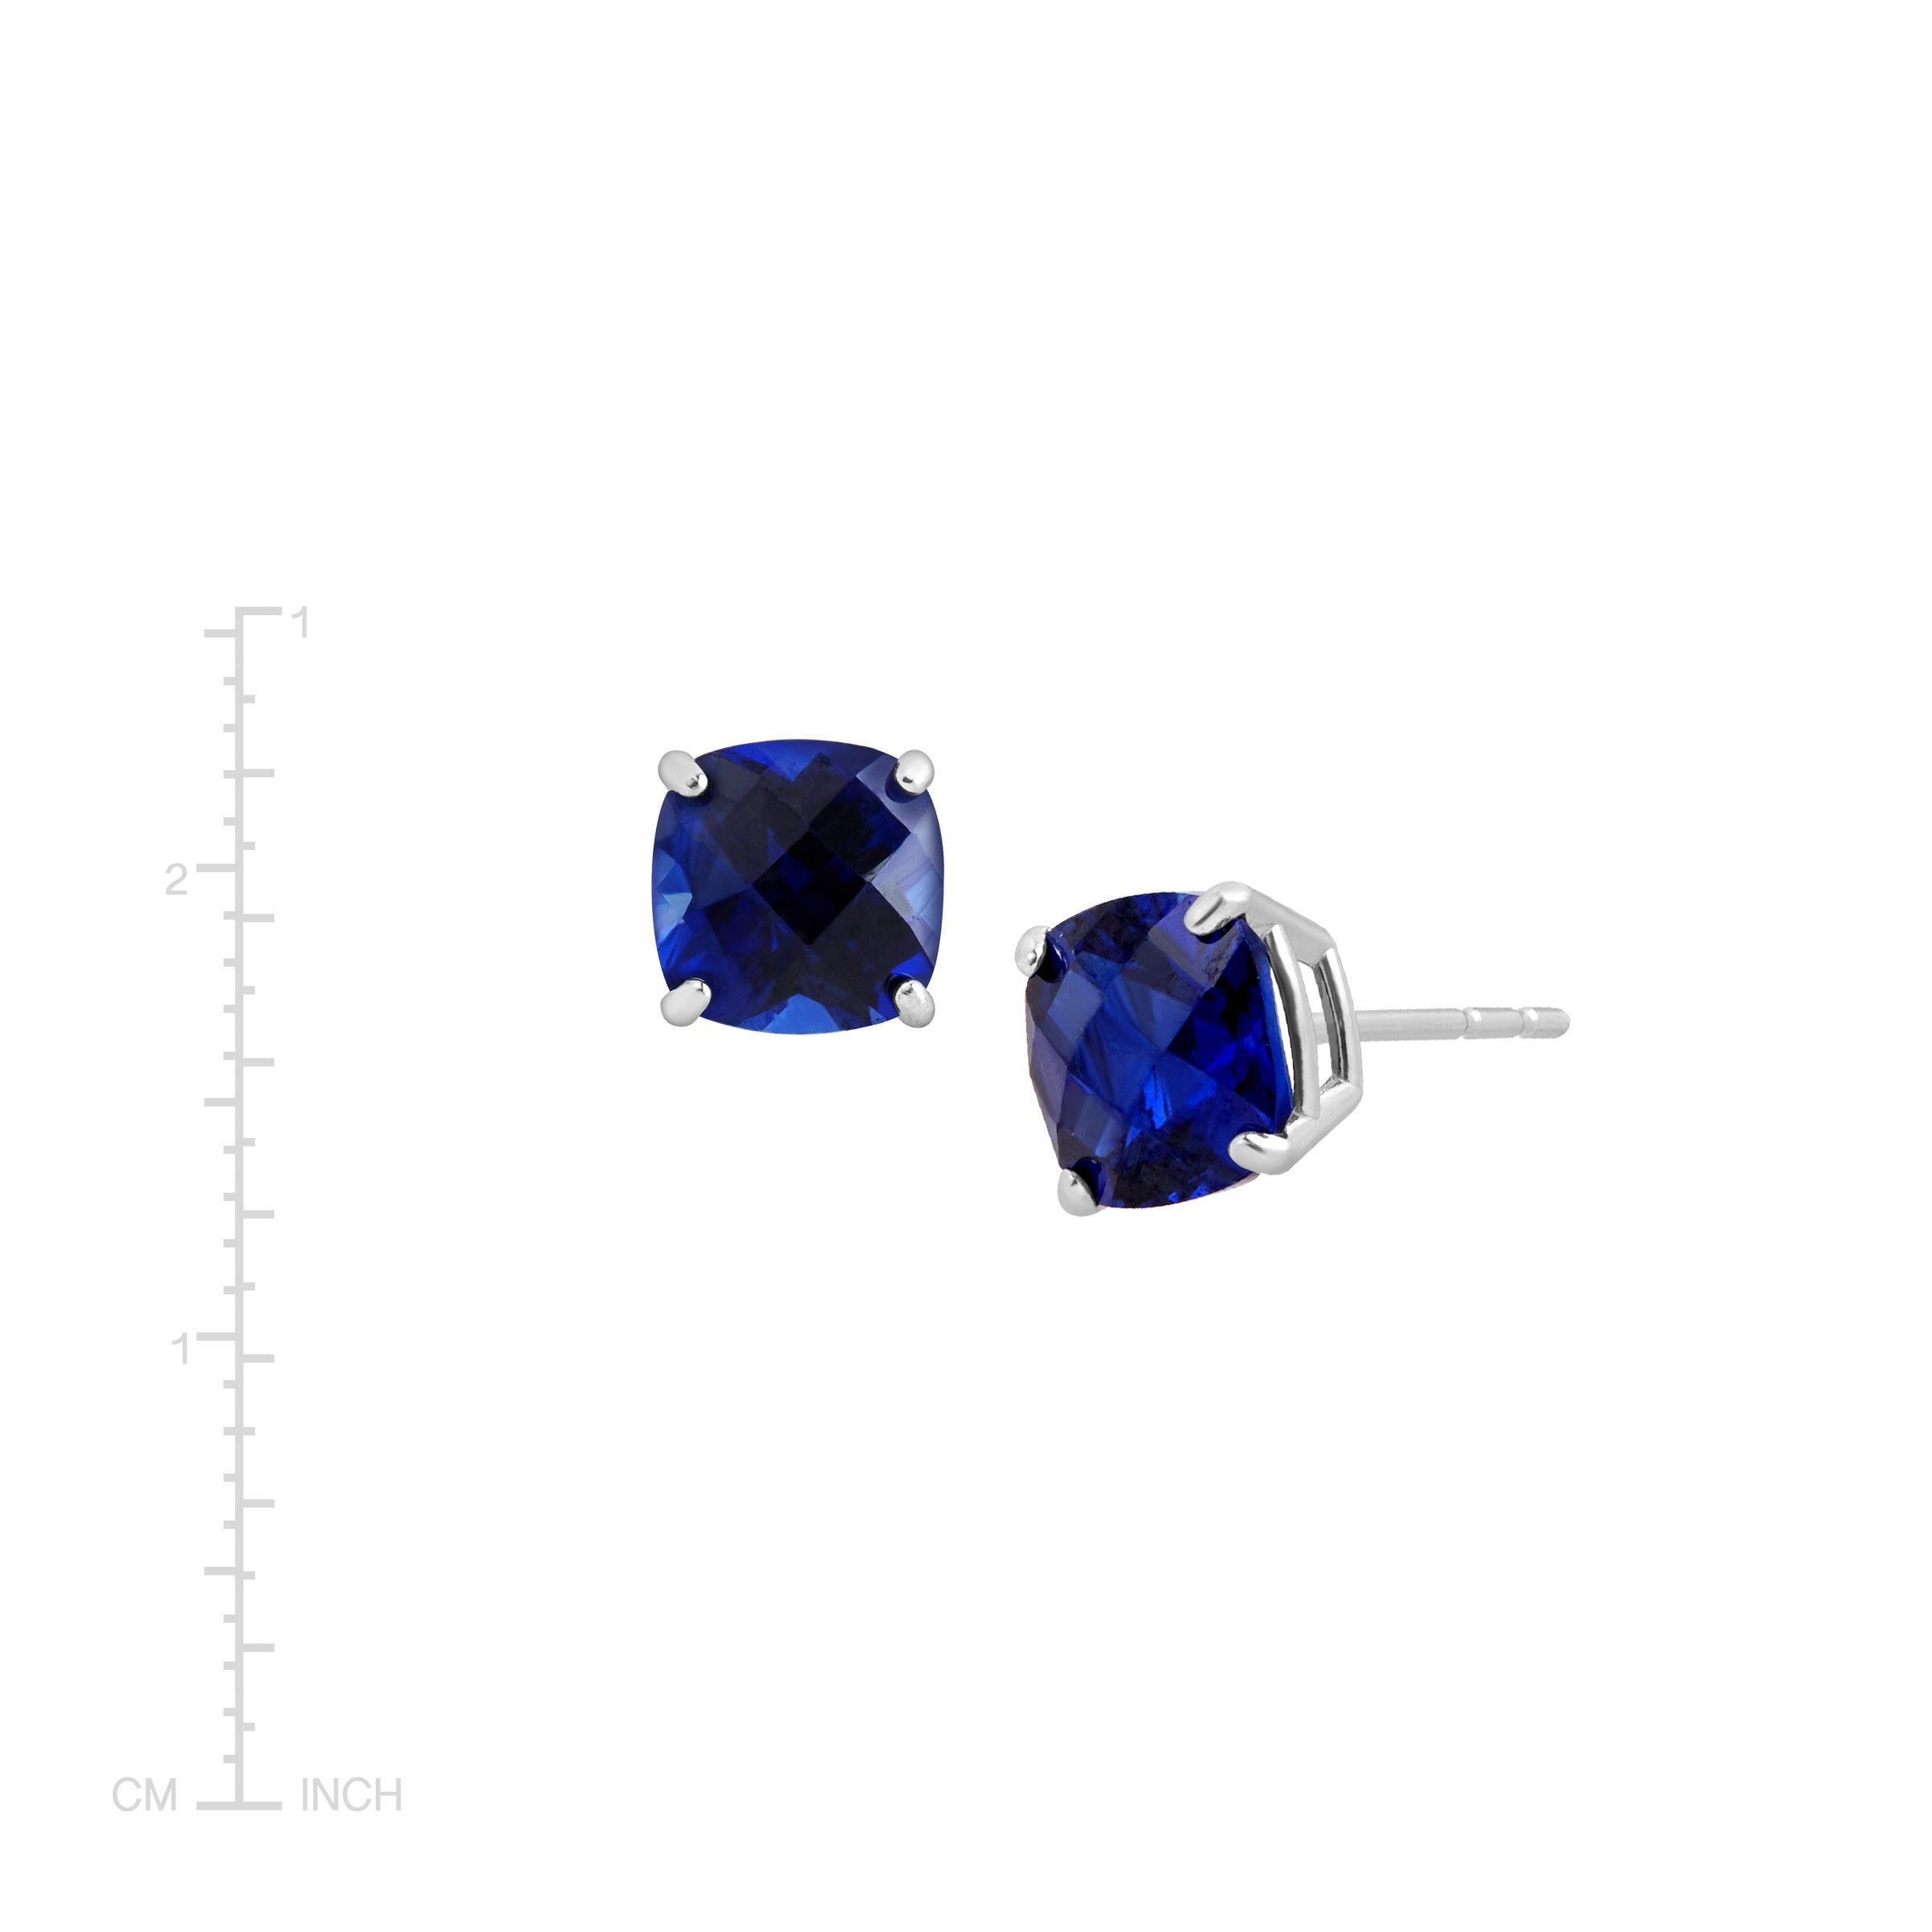 Cushion-Cut-Color-Stone-Stud-Earrings-in-14K-Gold thumbnail 43